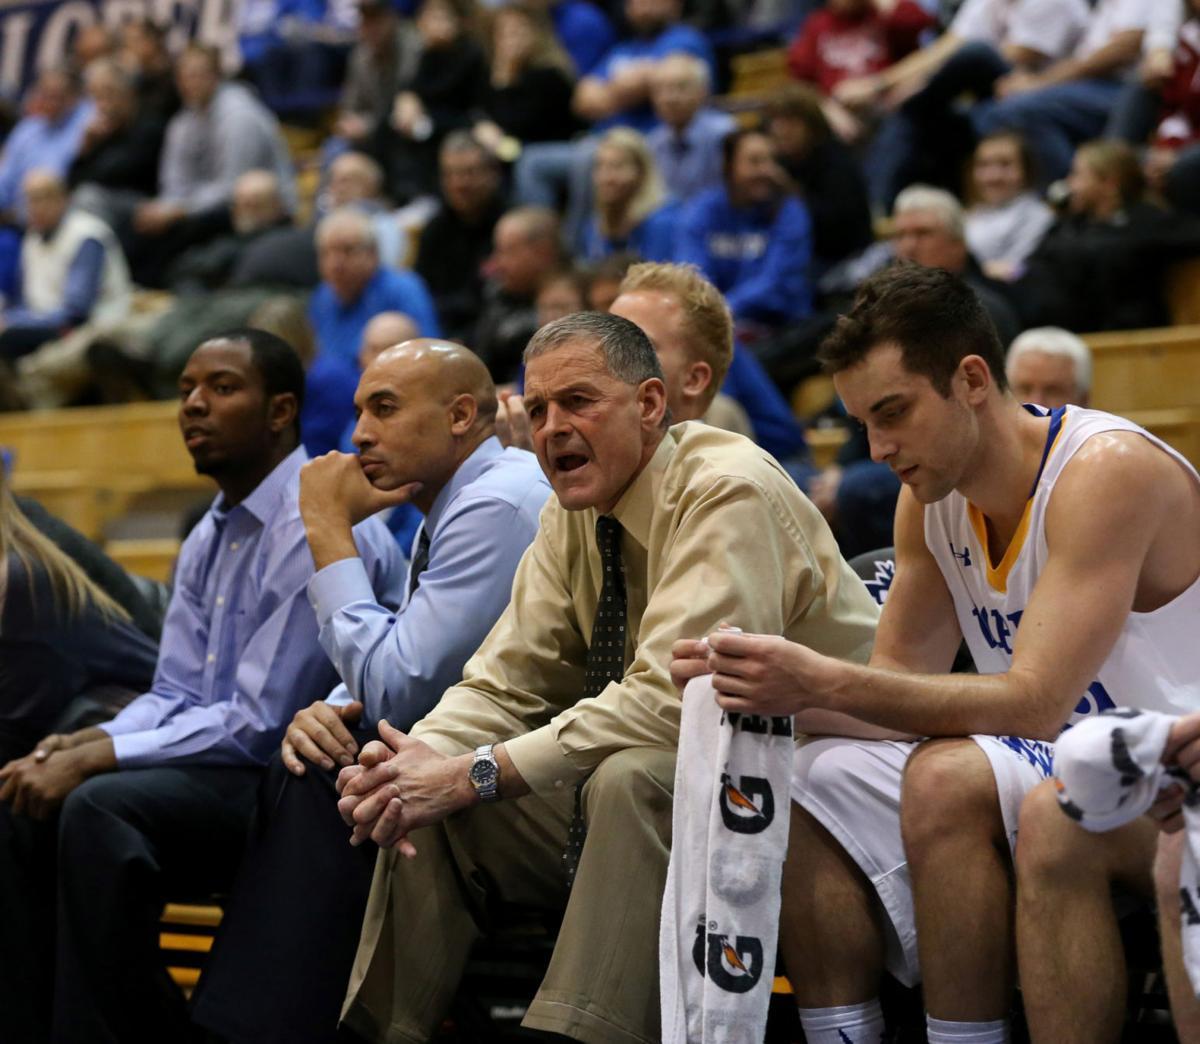 Shatel: UNK great Tom Kropp is switching from coach to fan ...